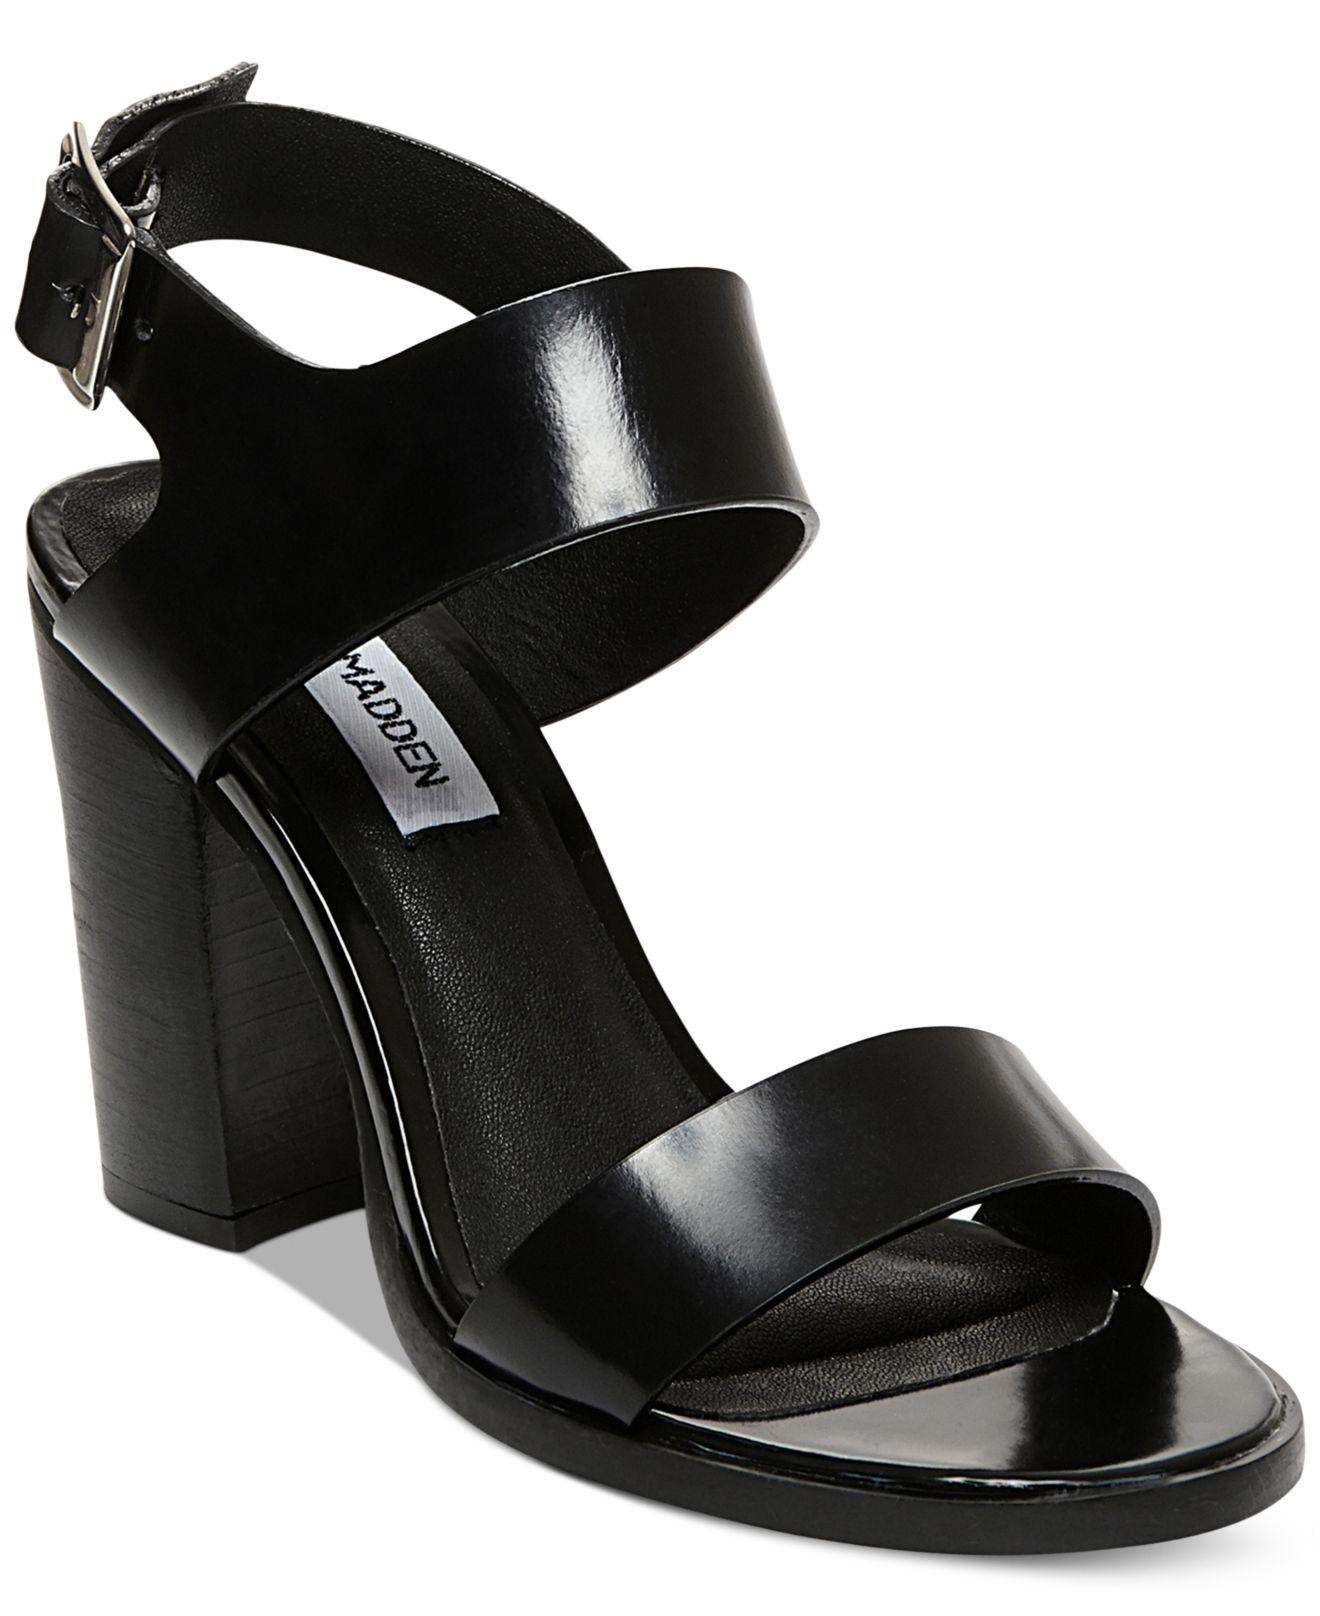 Lyst Steve Madden Women S Blaair Block Heel Sandals In Black